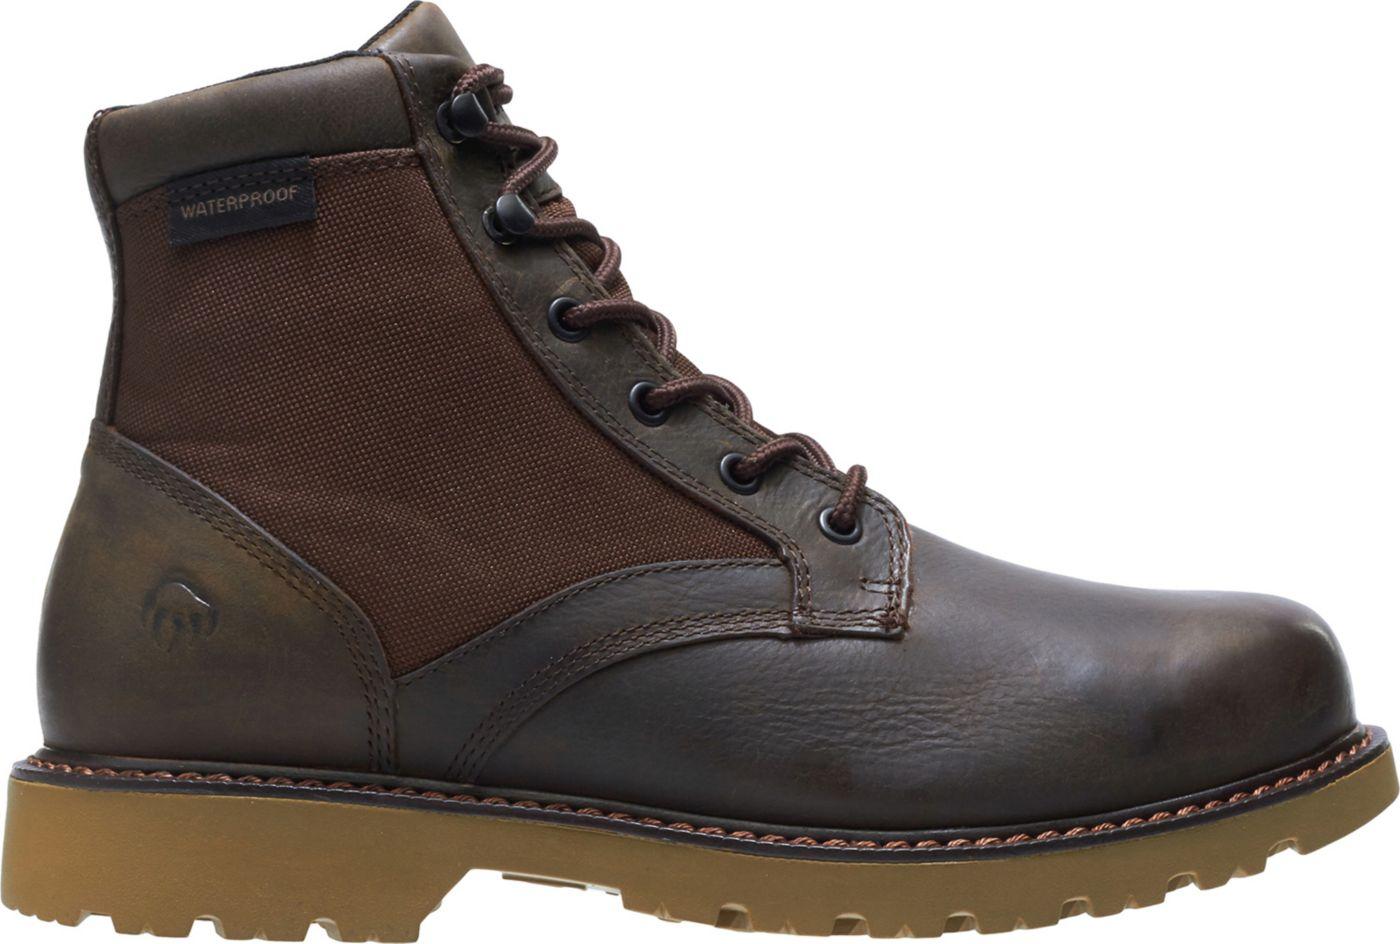 Wolverine Men's Field Boot Waterproof Hiking Boots